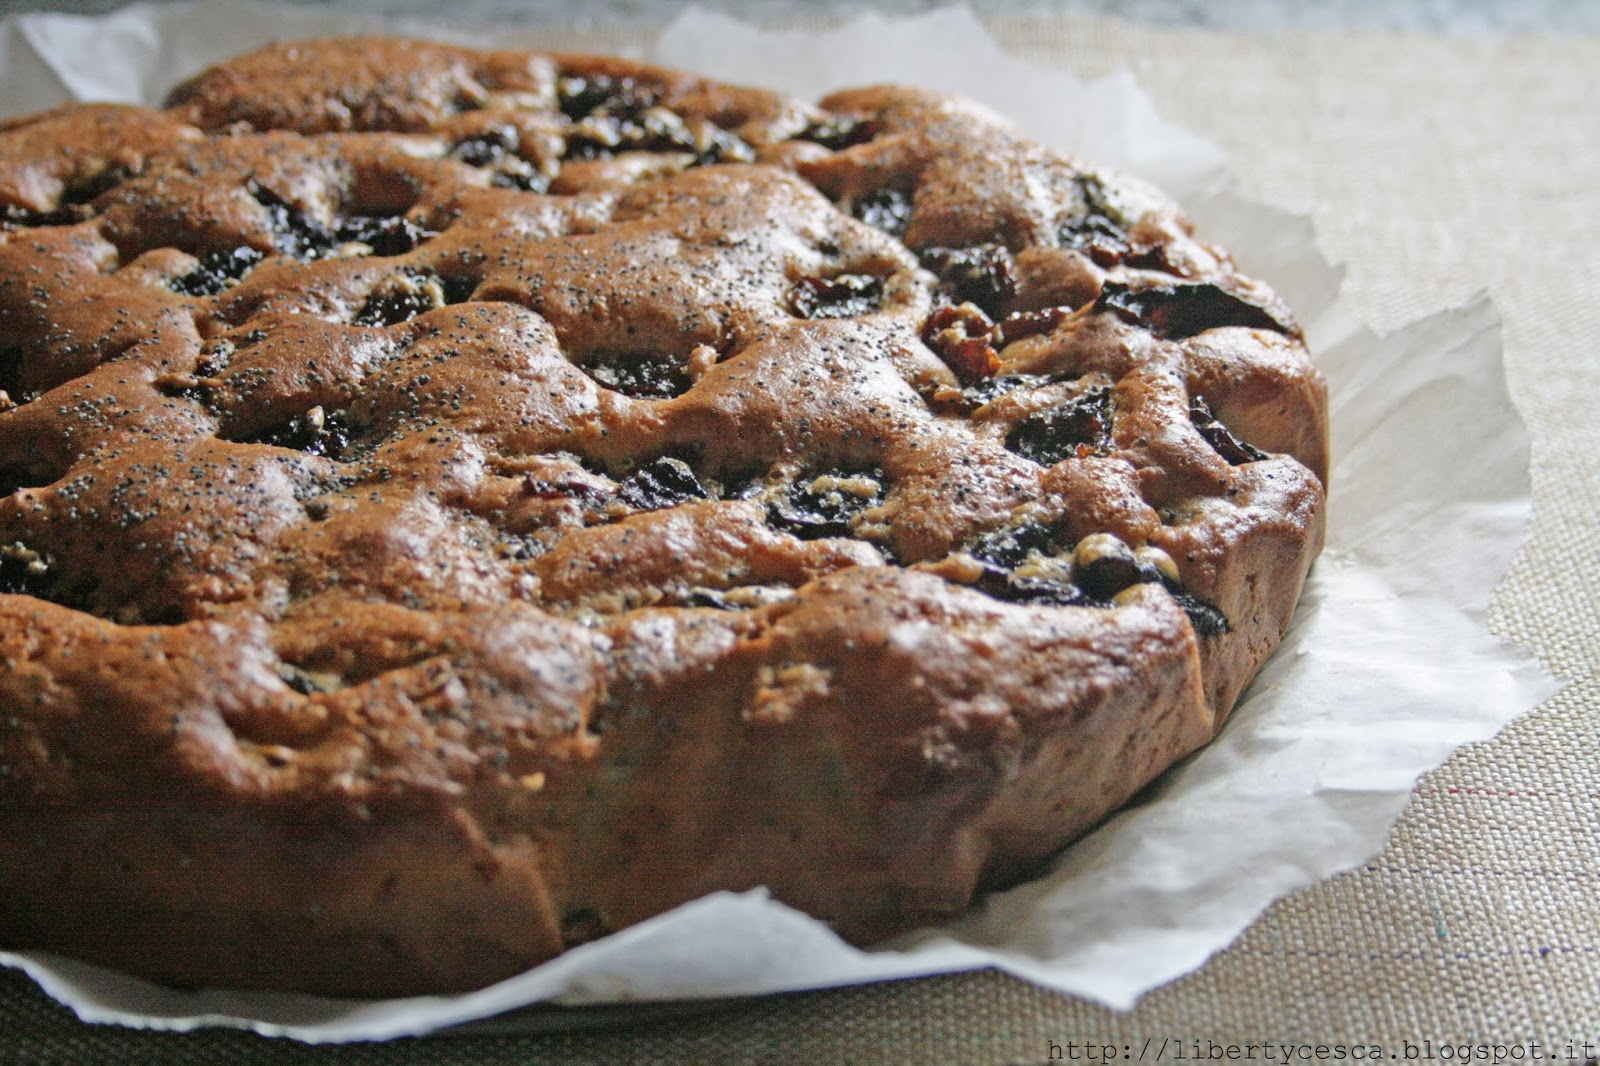 torta di prugne secche e semi di papavero / cake with dried plums and poppy seed